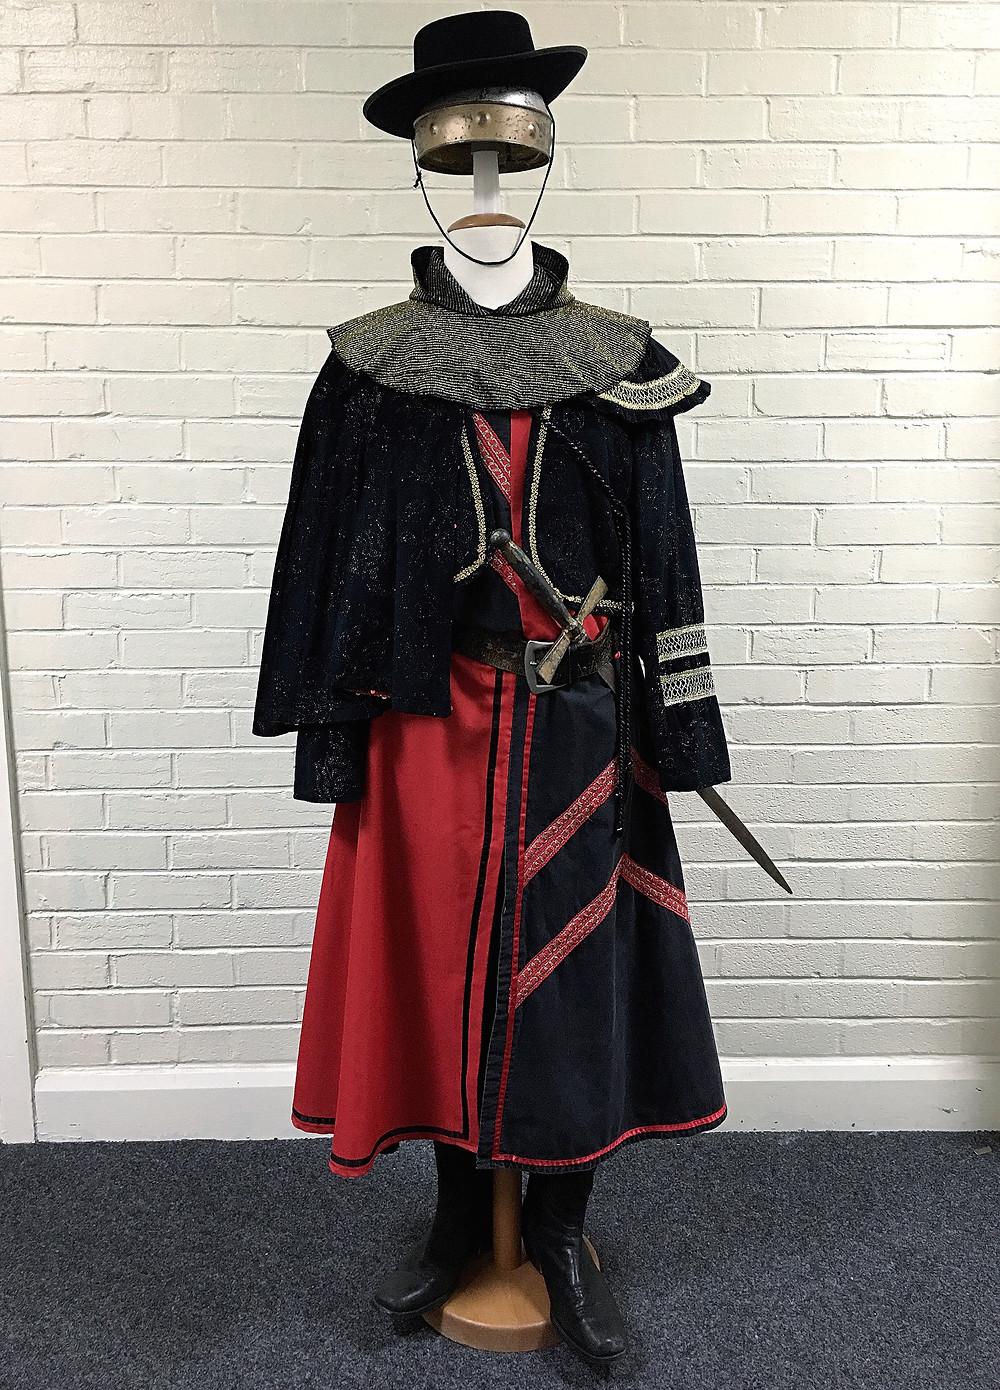 Spamalot - The Spanish Knight